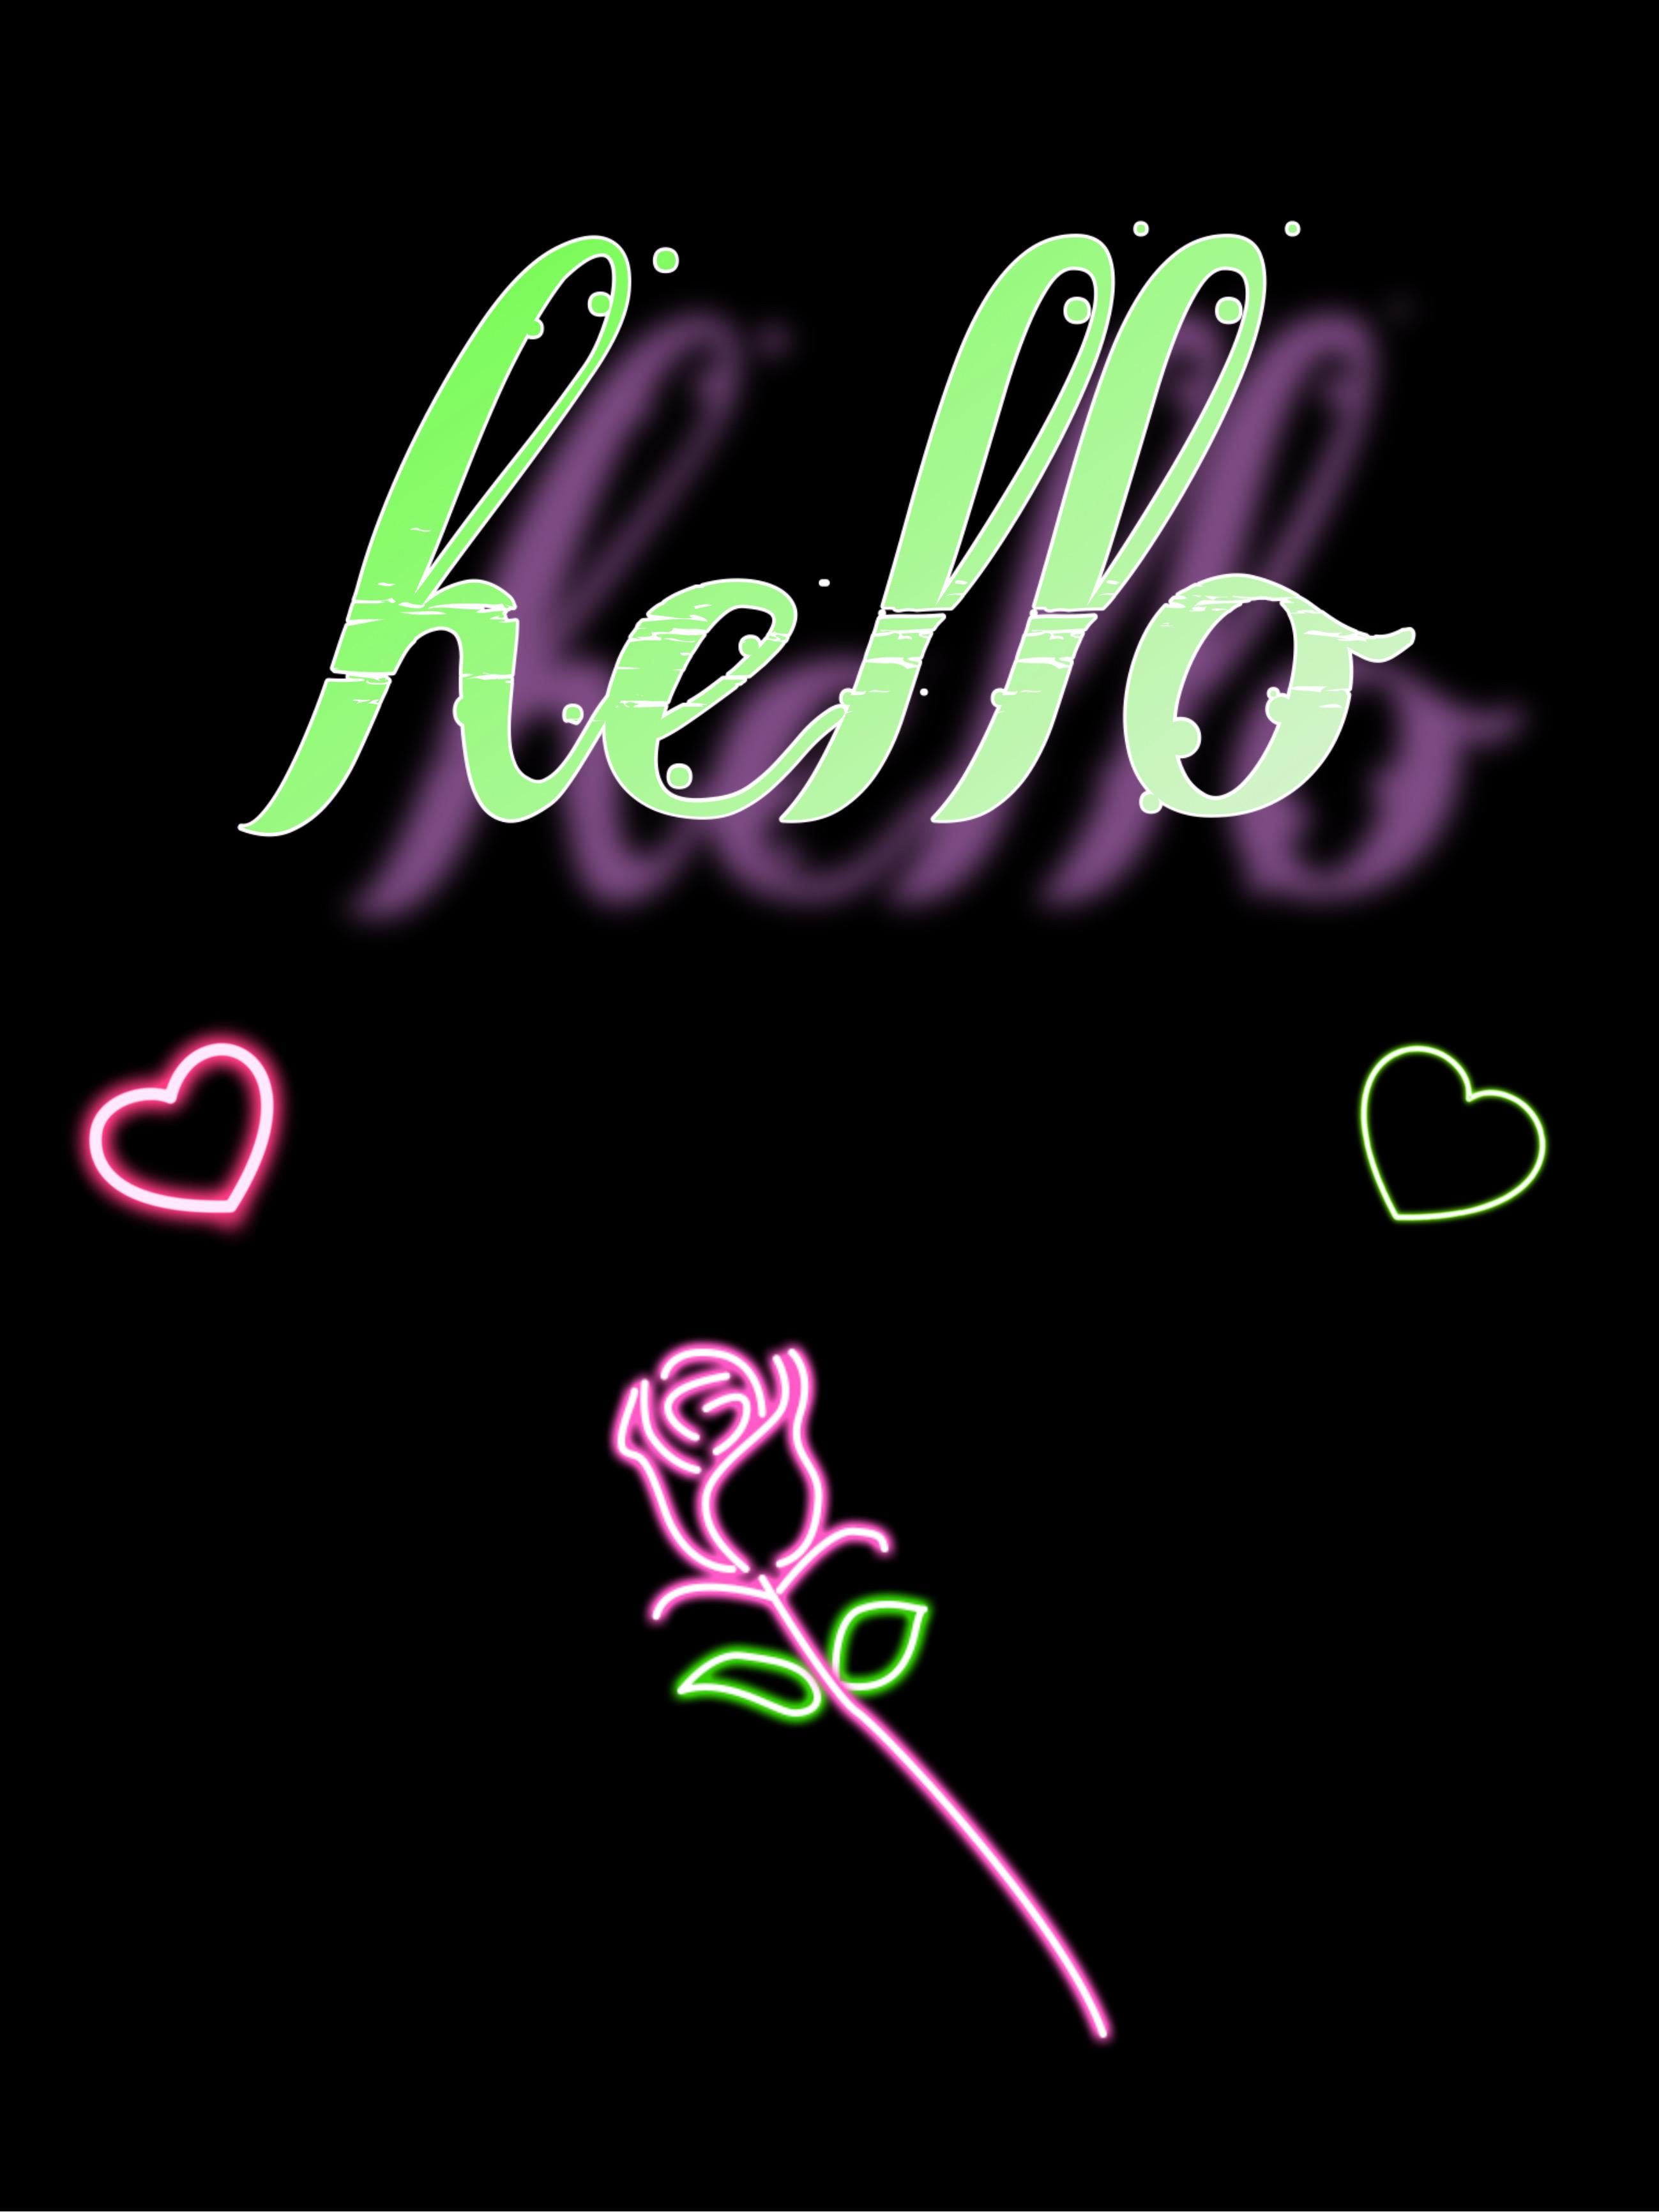 Freetoedit Hello Wallpaper Neon Rose Pink Green Graphic Design 2991526 Hd Wallpaper Backgrounds Download